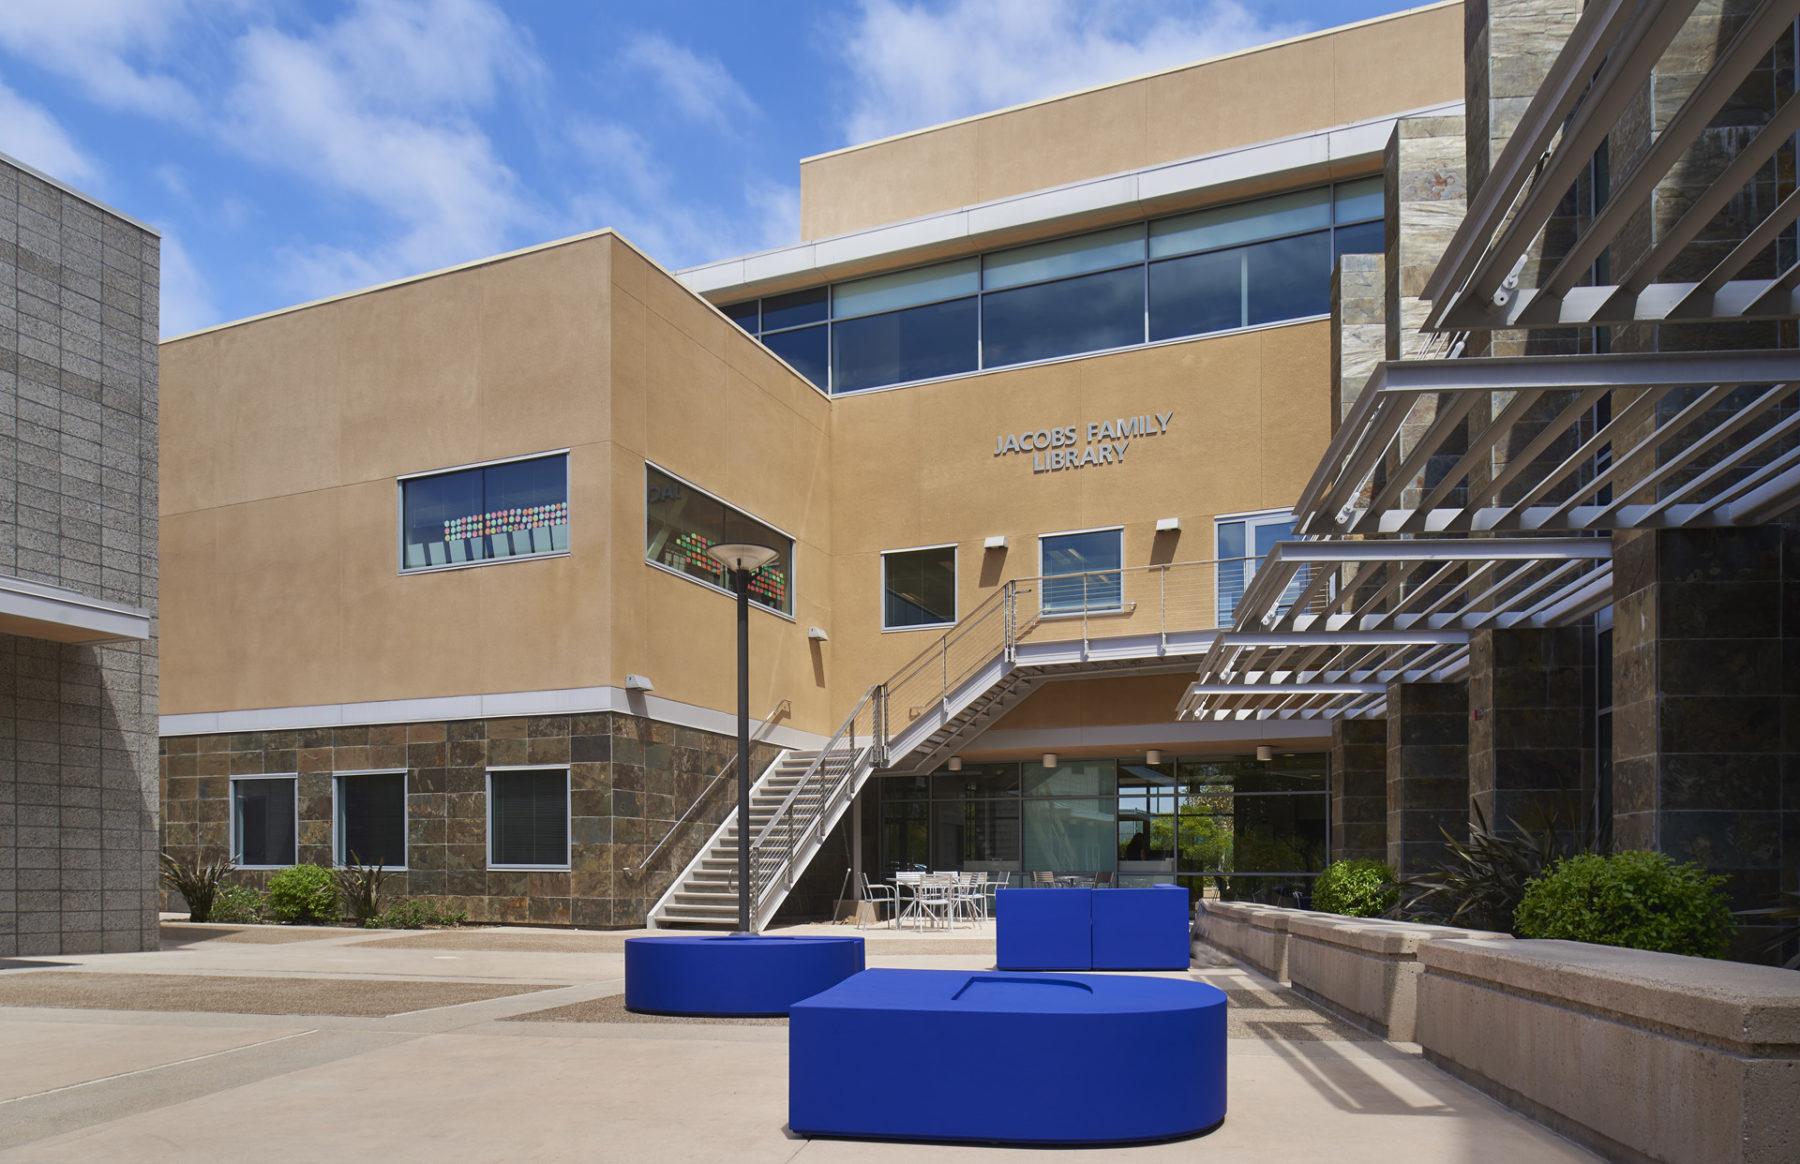 Dempsey La Jolla Day School